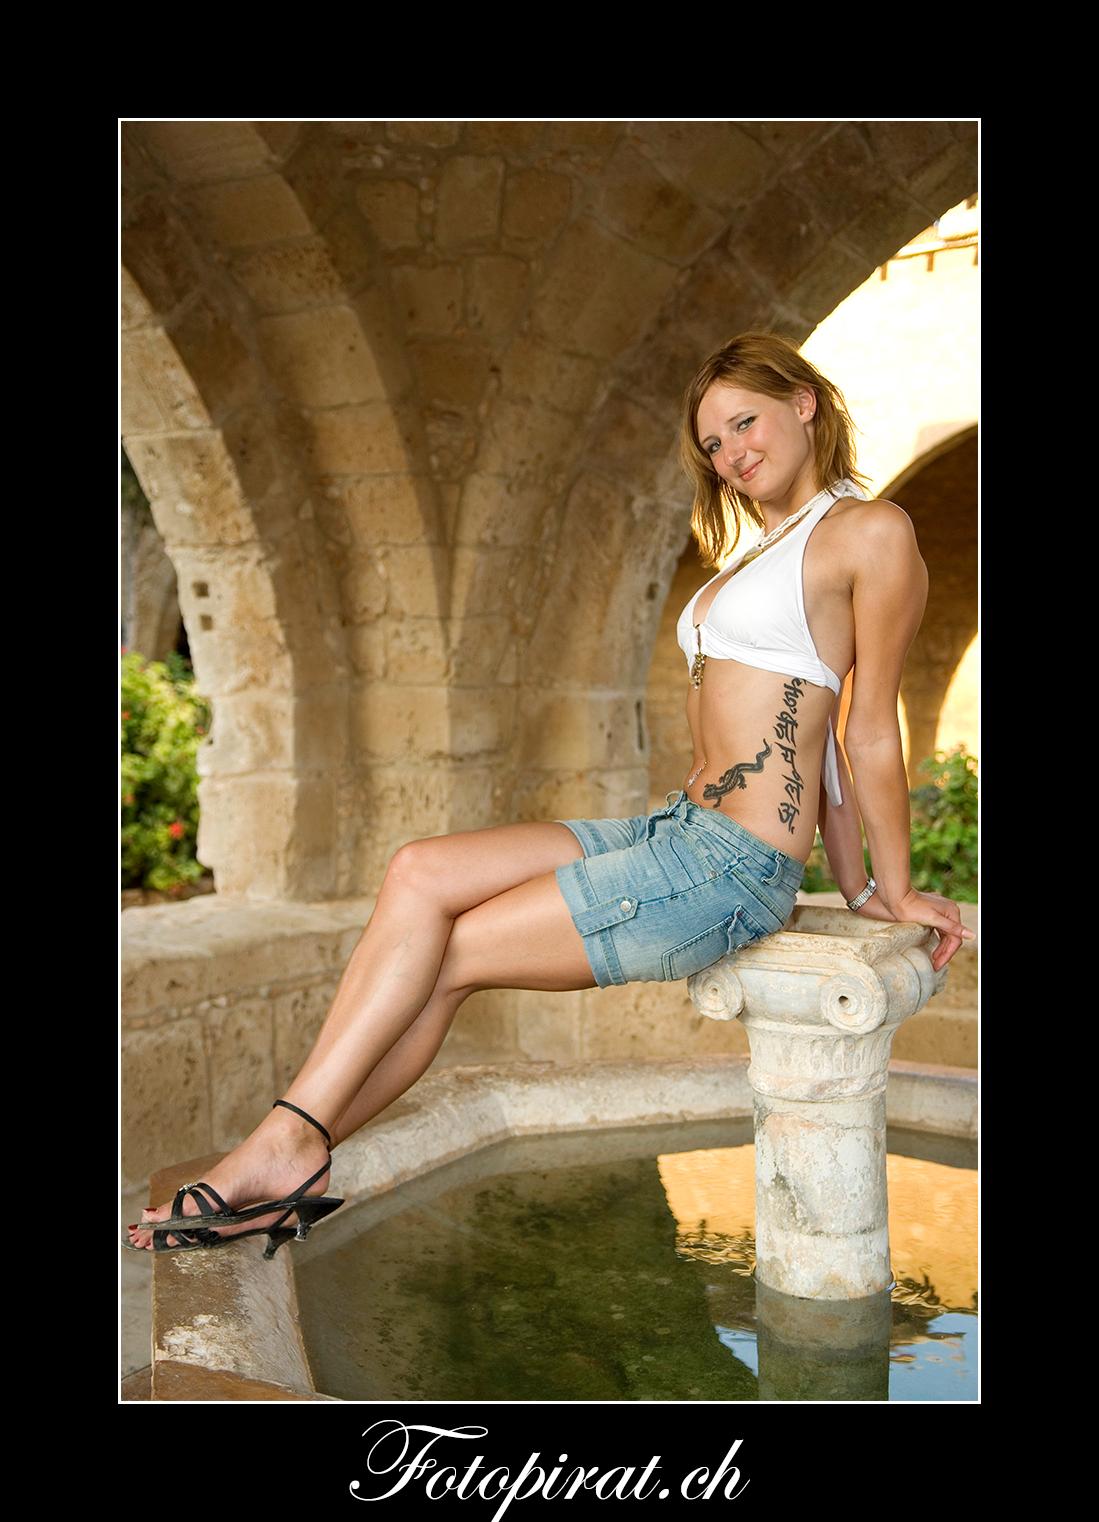 Fotoshooting On Location, Kloster Ayia Napa, Monokini, Modelagentur, Sportmodel, Fotomodel